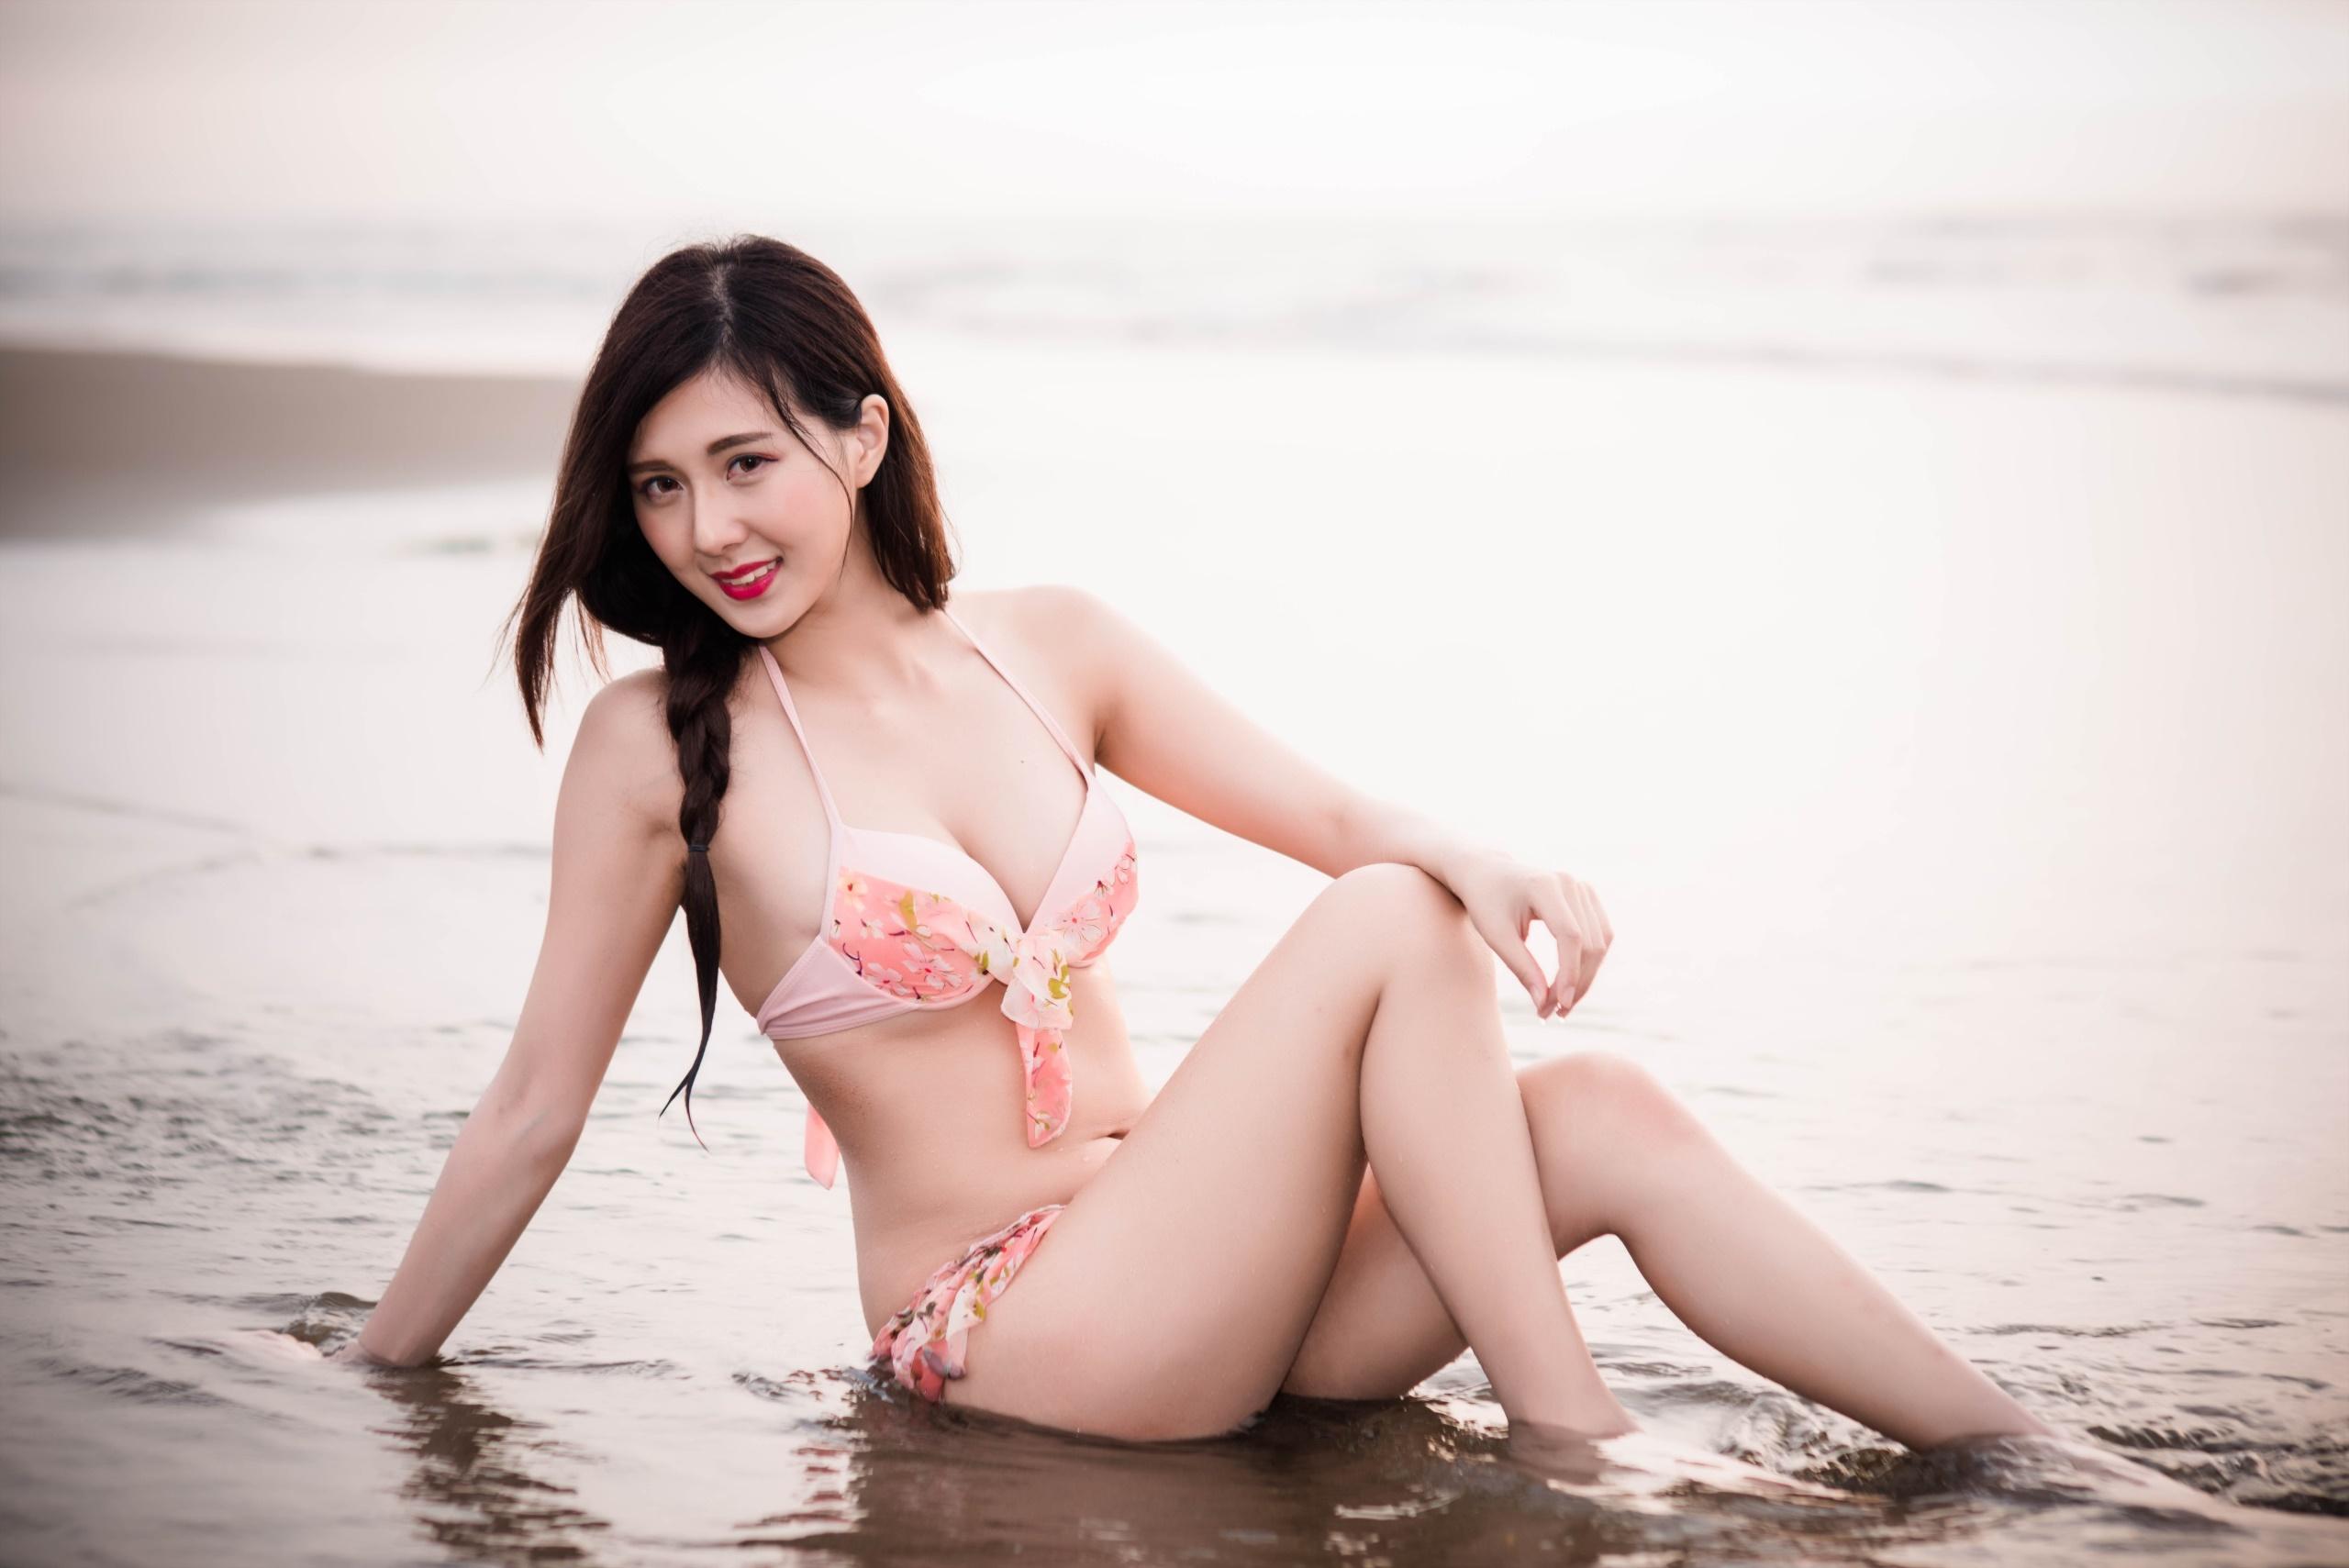 Japanese bikini girl wallpaper